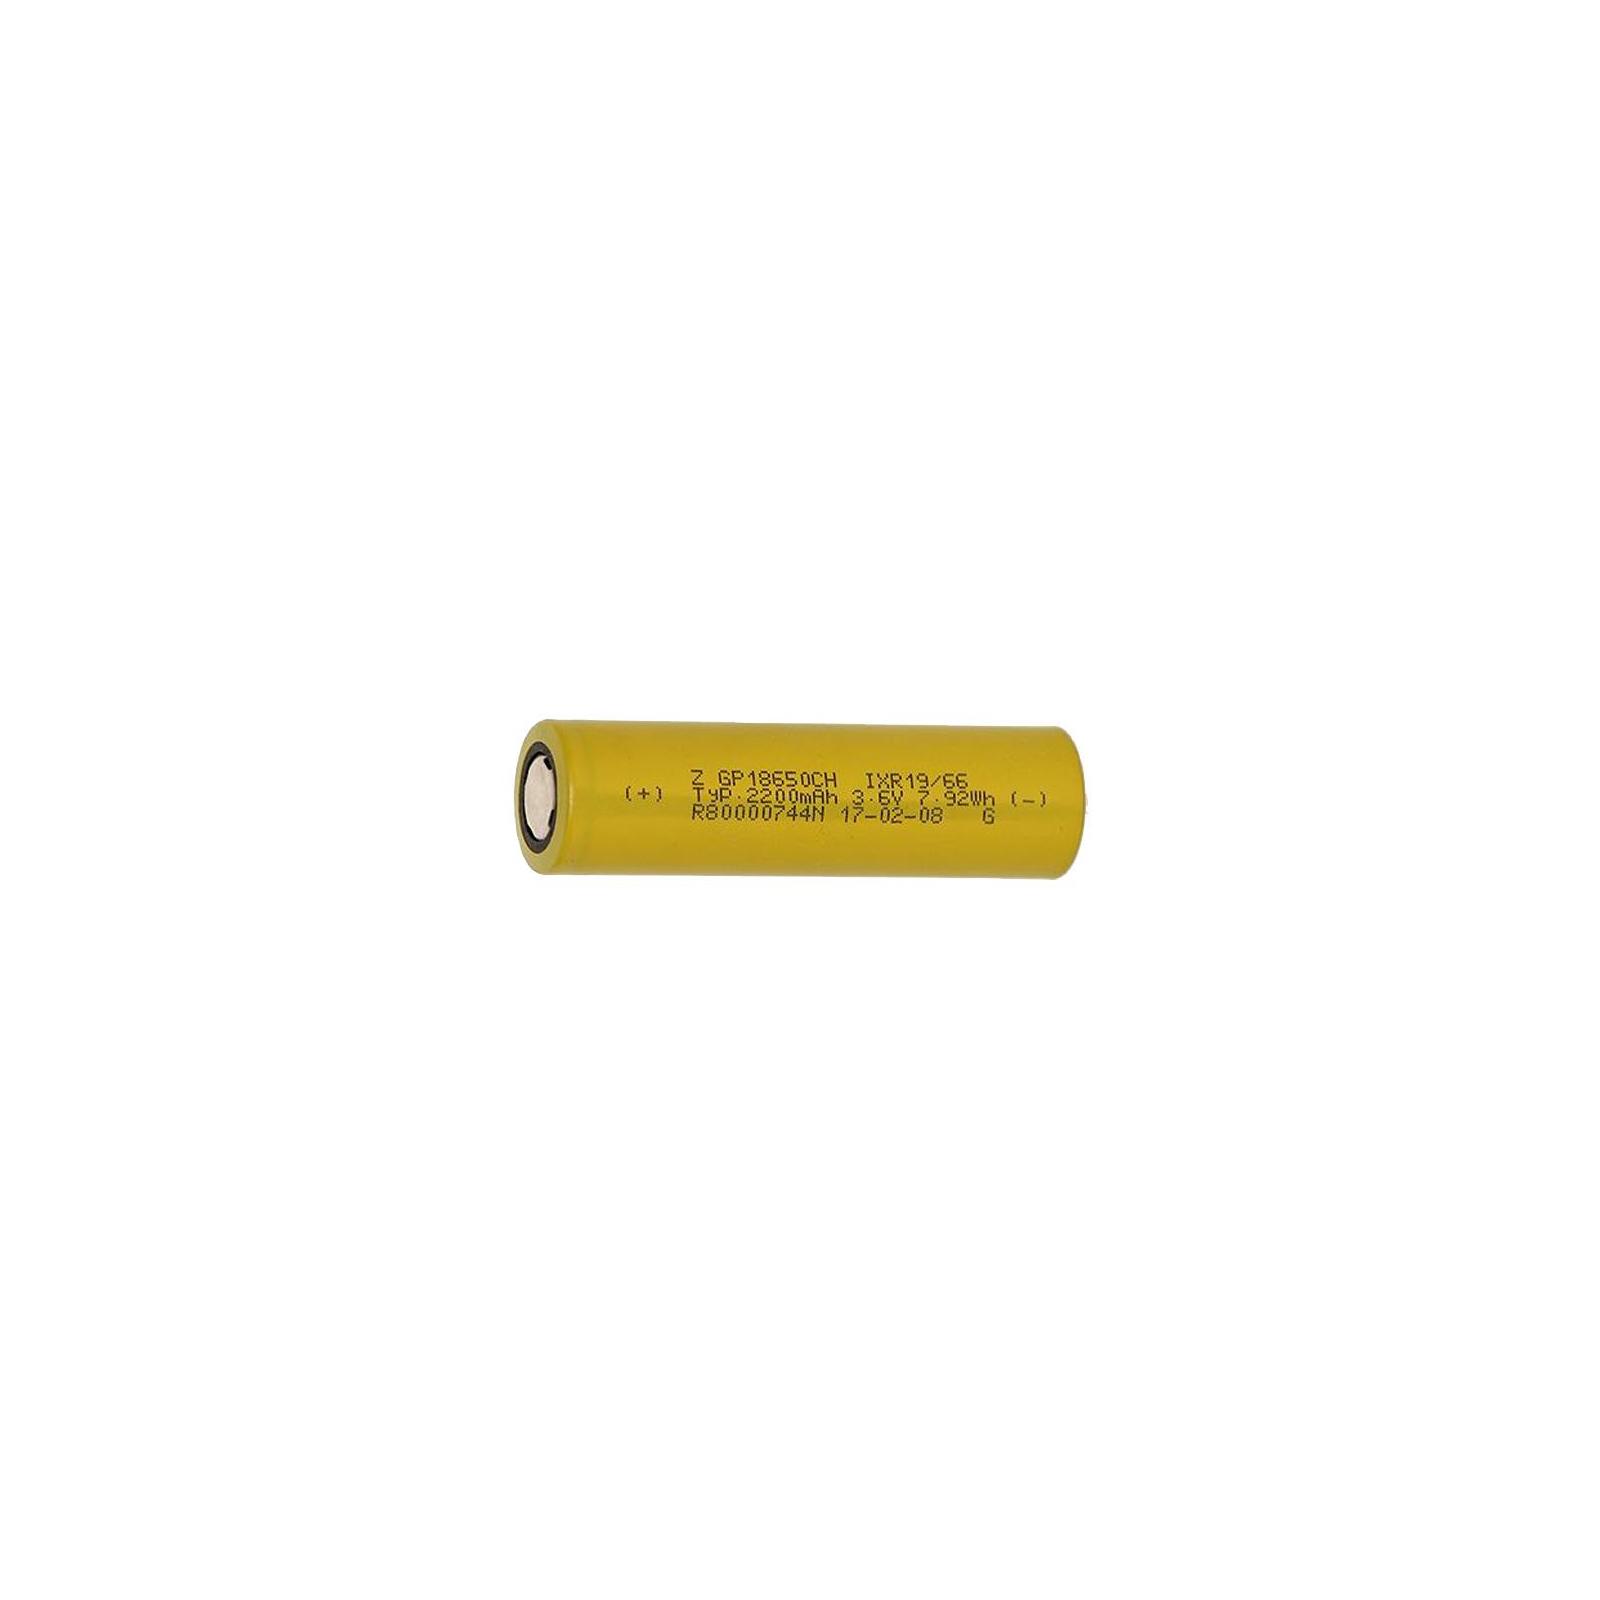 Аккумулятор Gp 18650 2200 mAh (max 6.6А) (GP1865T220)